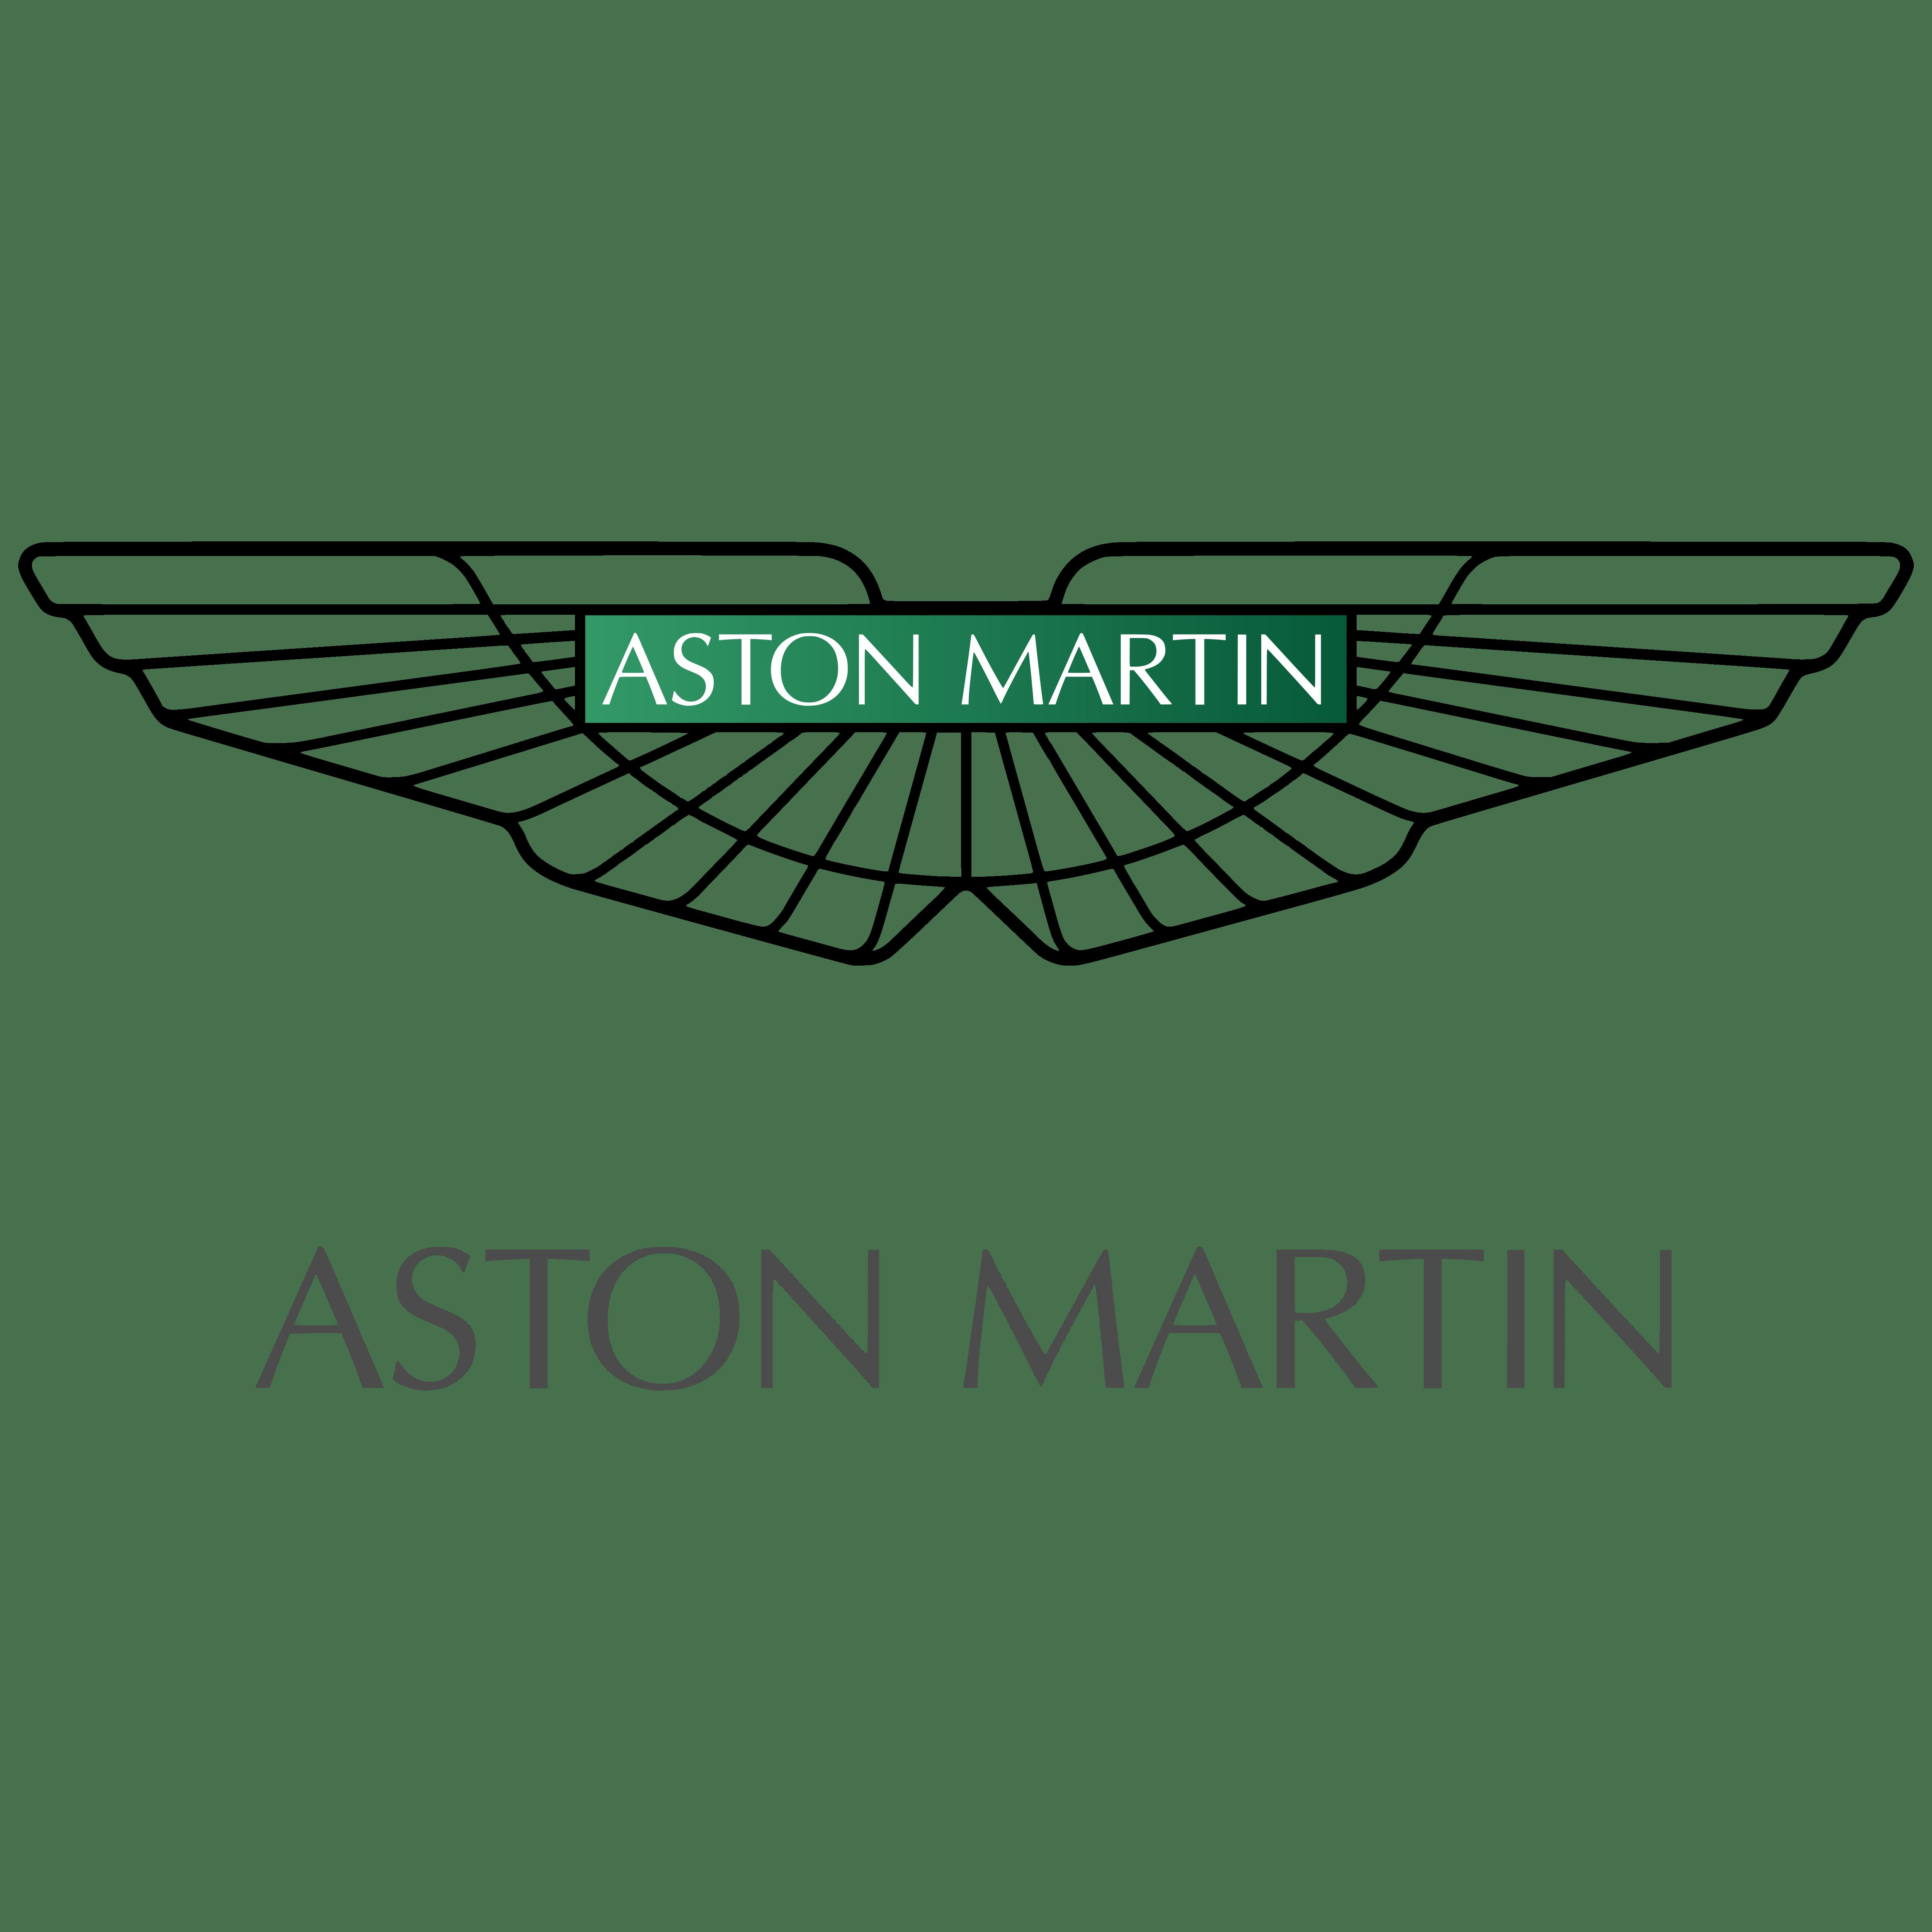 Aston Martin | Fundamentale Aktienanalyse